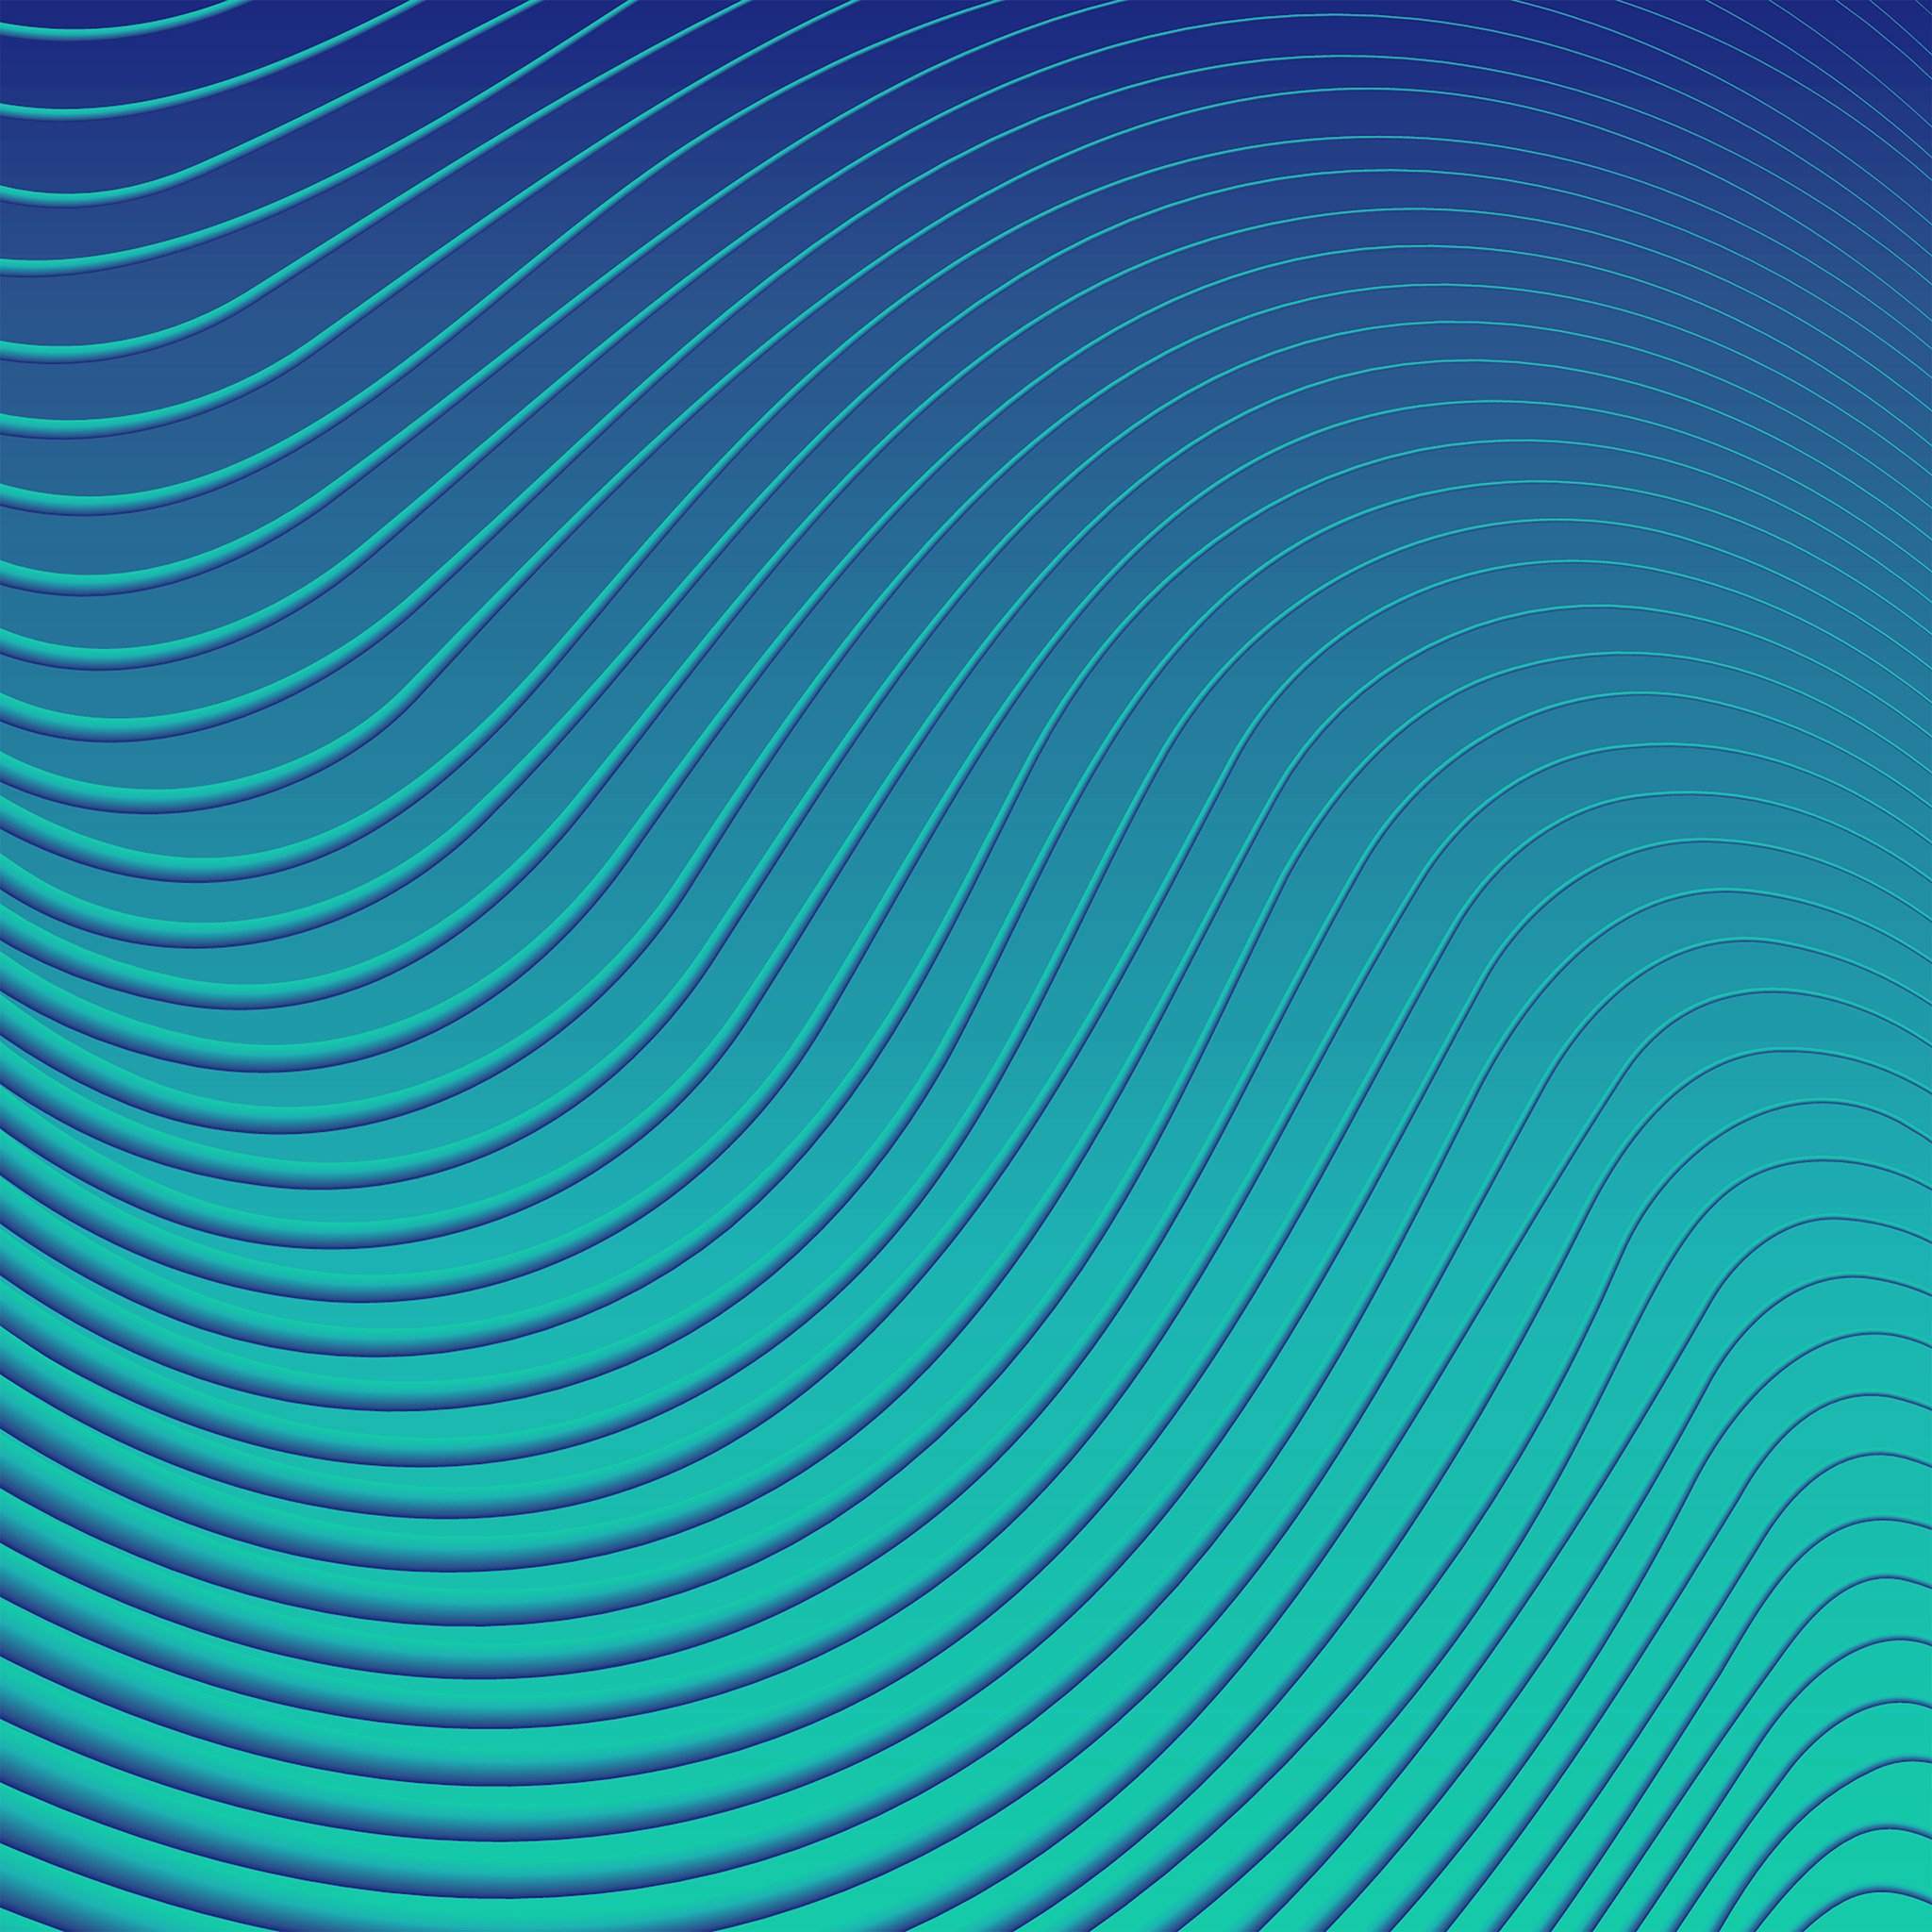 vp13-curve-blue-green-pattern-wallpaper